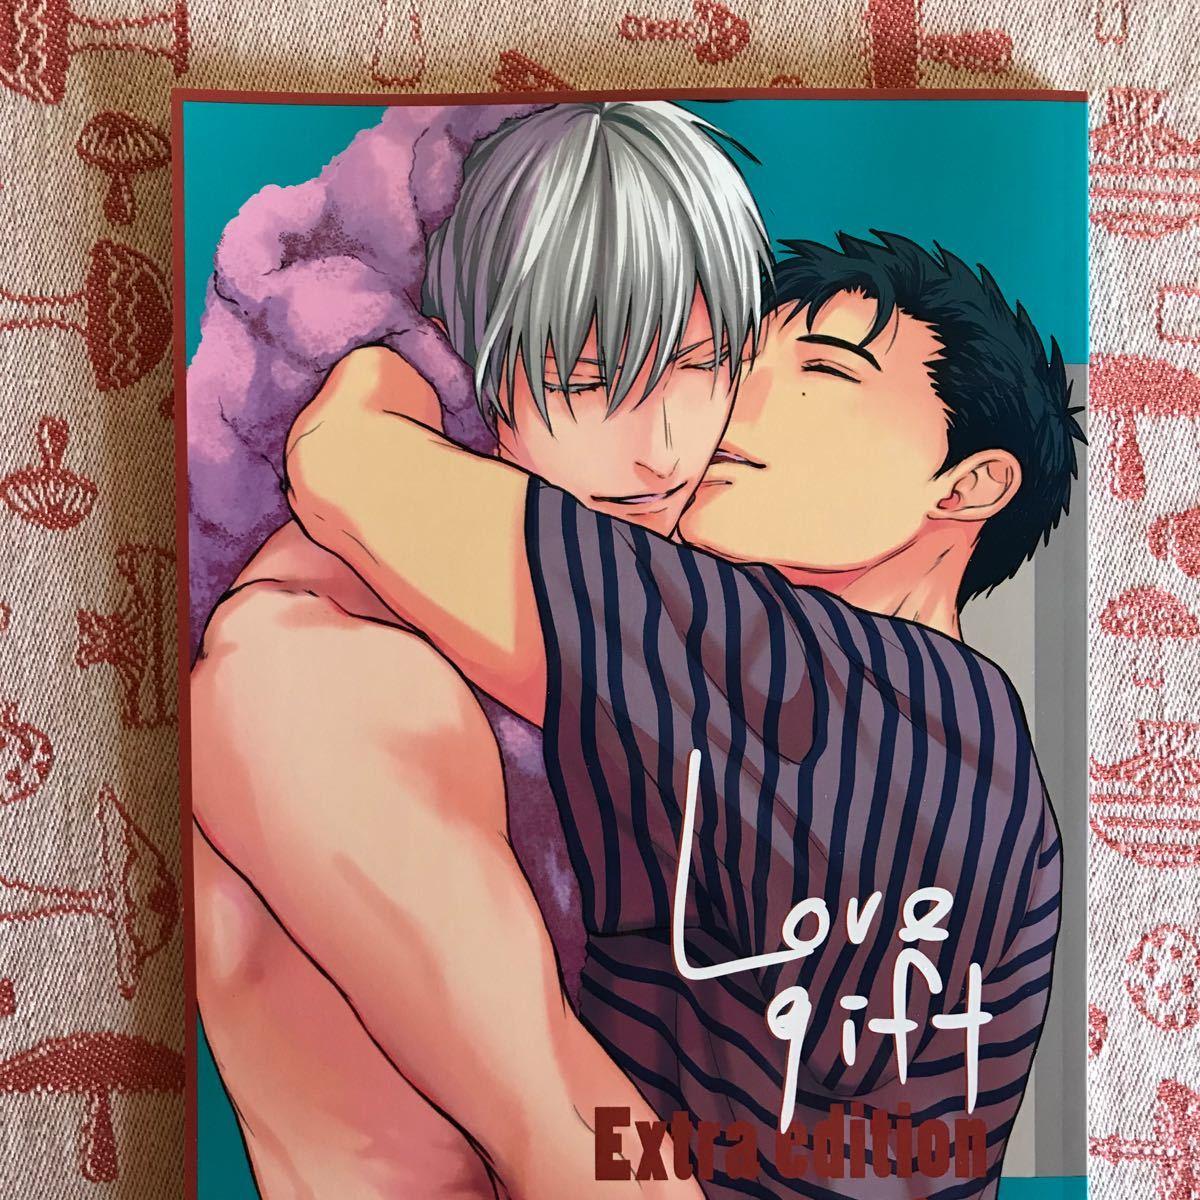 BL 同人誌 漫画 Love gift 一ノ瀬ゆま